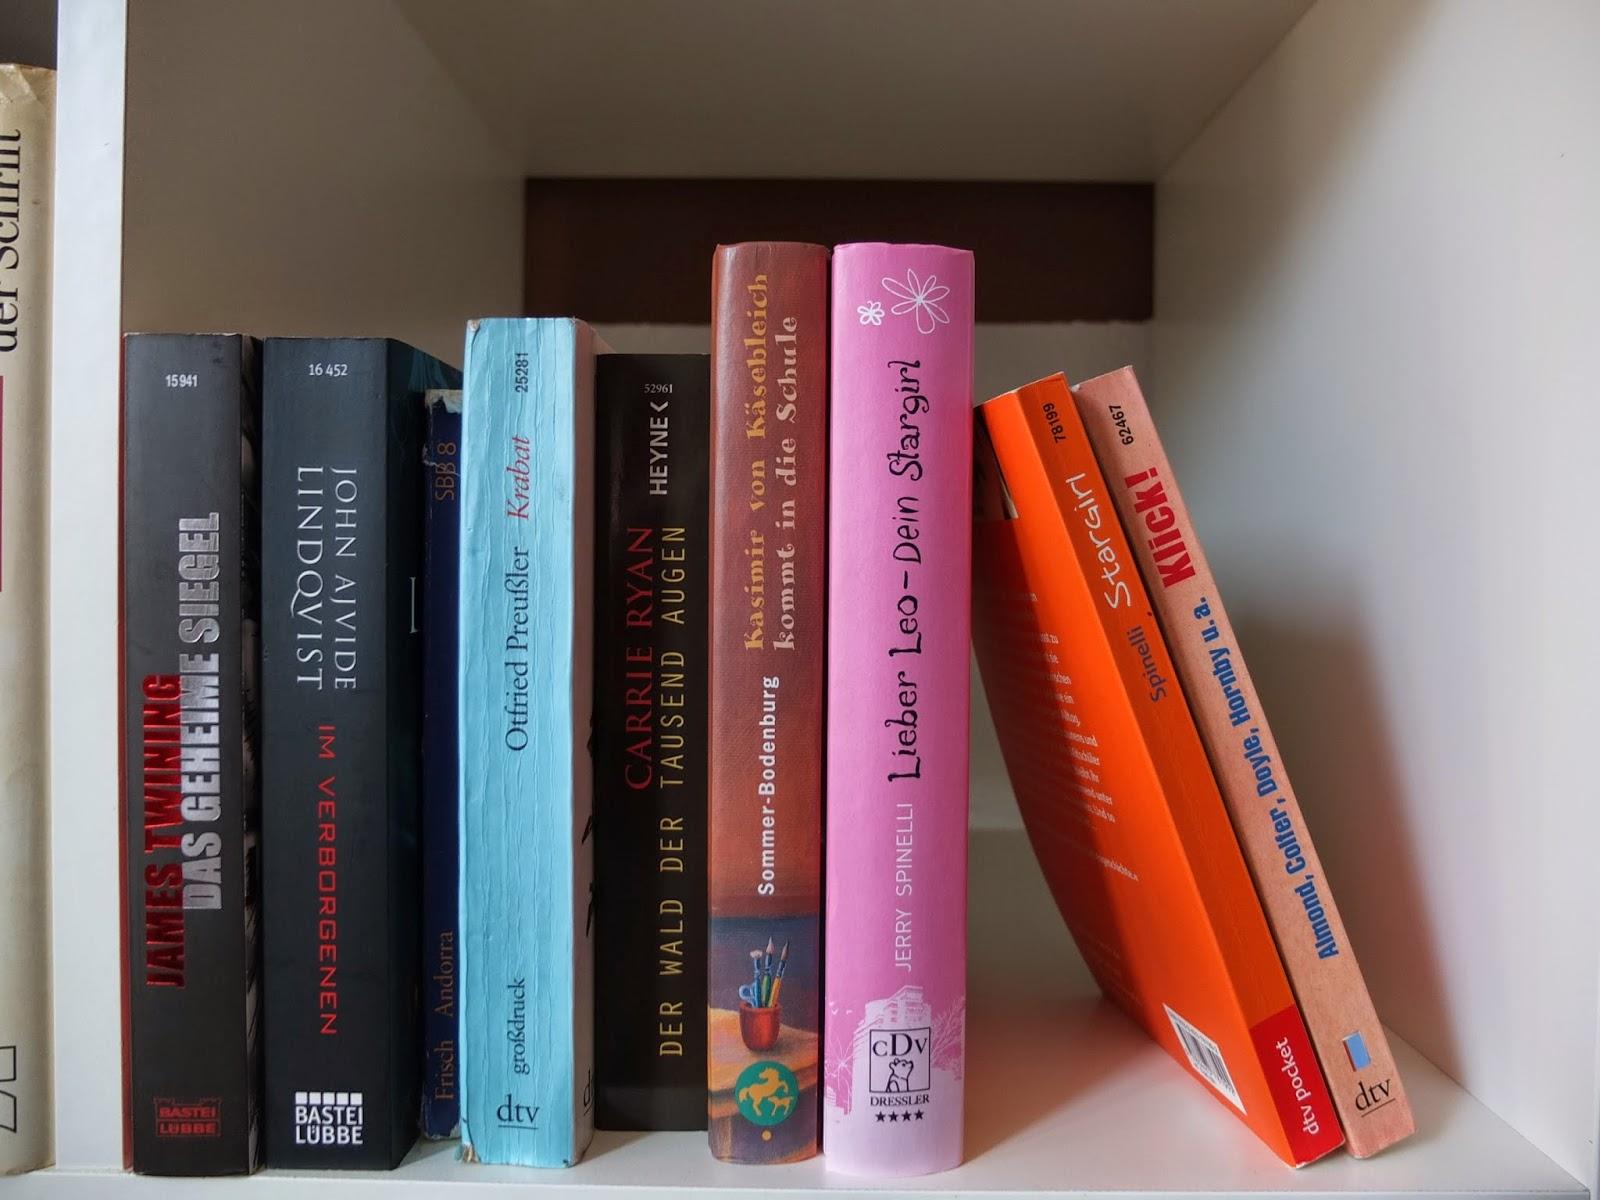 Bücherreihe clipart  Bücherreihe Clipart | ambiznes.com